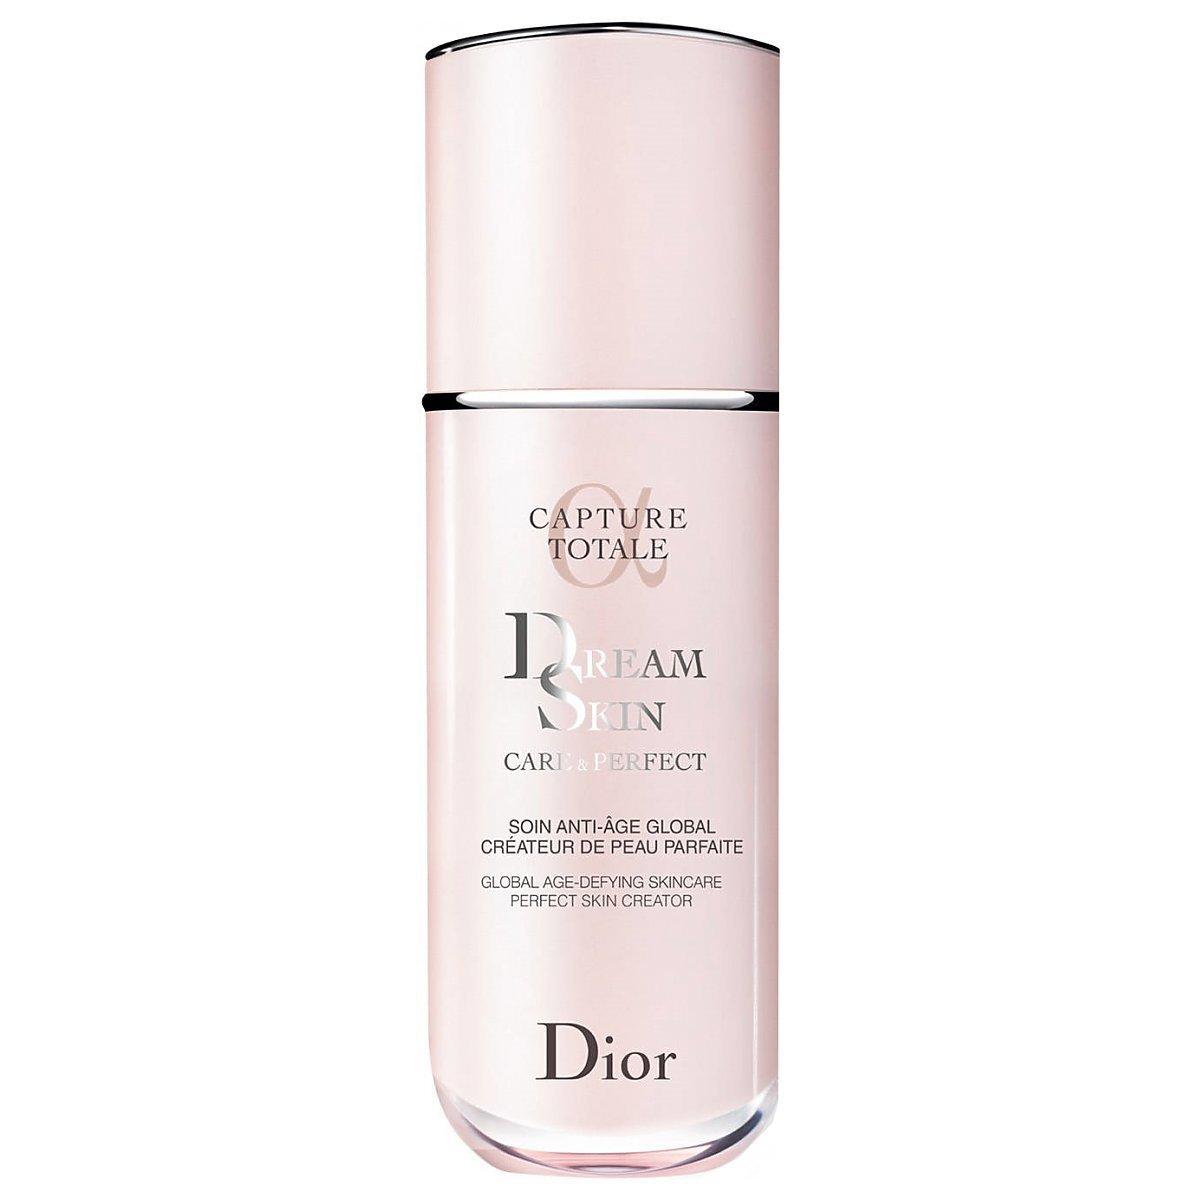 Christian Dior Capture Totale Dream Skin Care & Perfect..